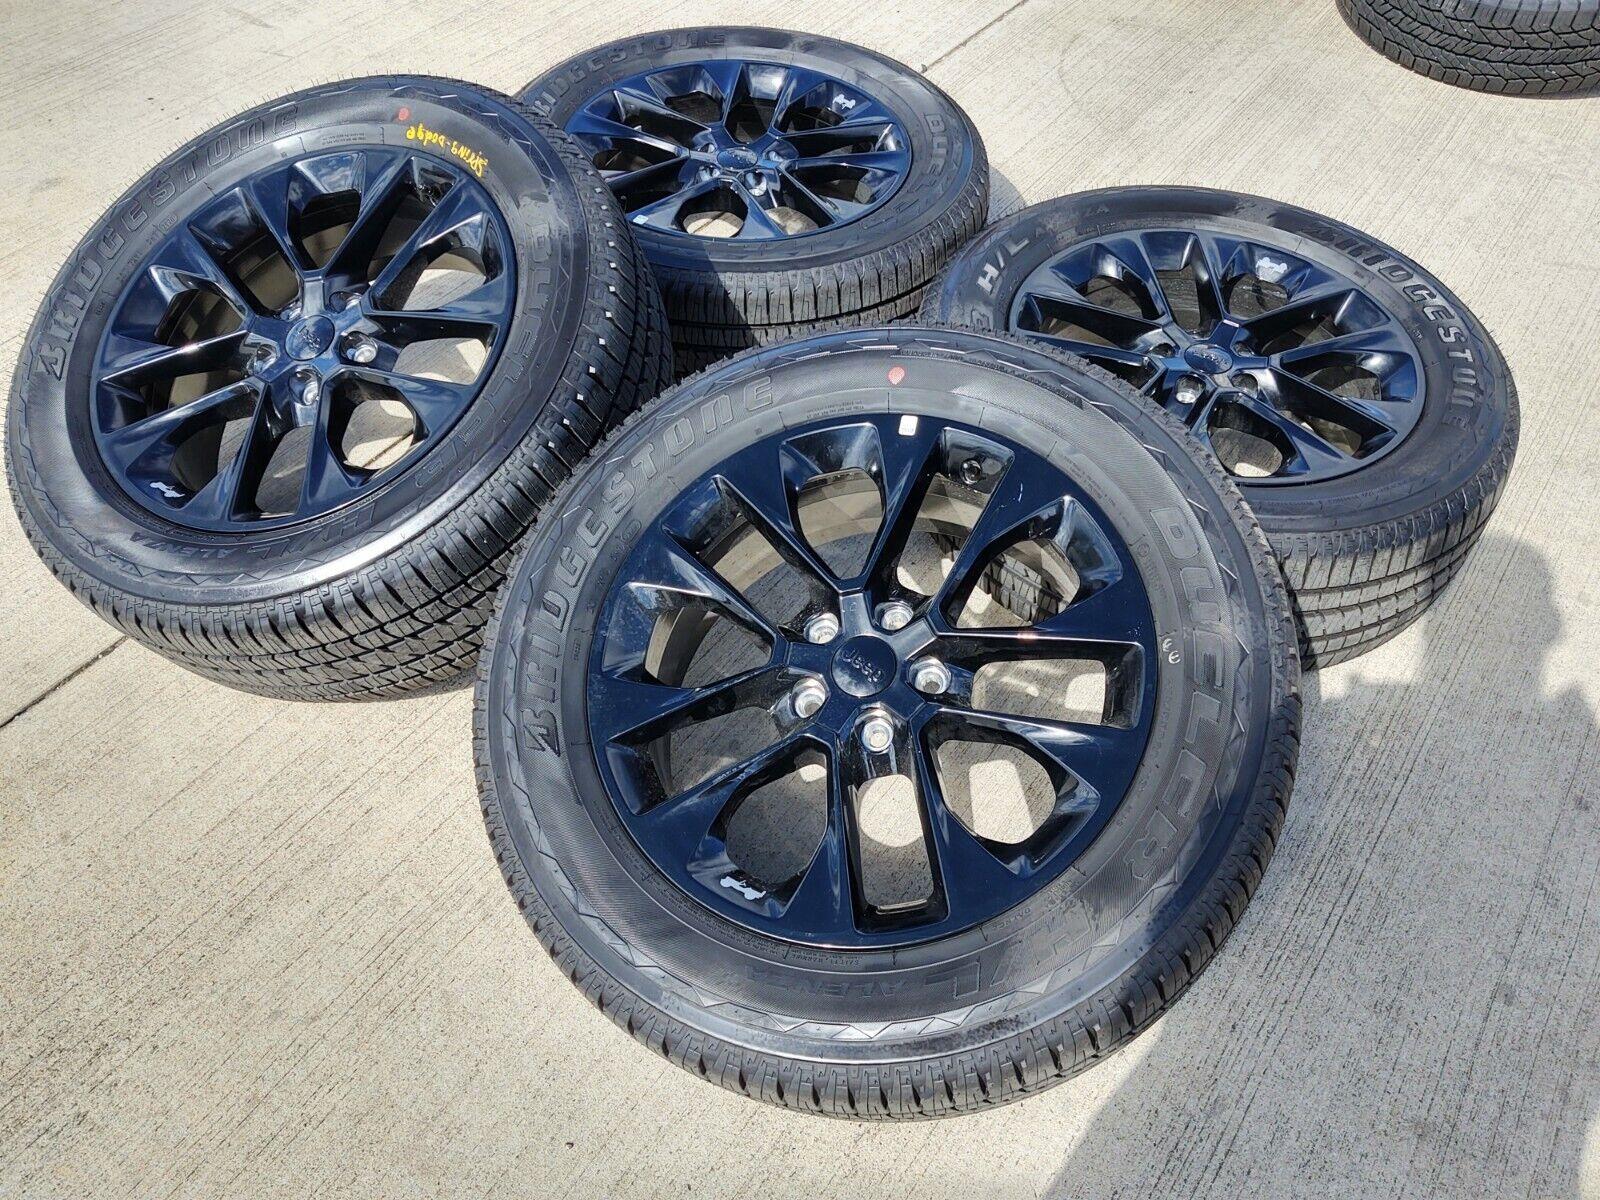 20 Jeep Wrangler High Altitude 2021 Oem Black Wheels Rims Gladiator 2020 96902 Ebay